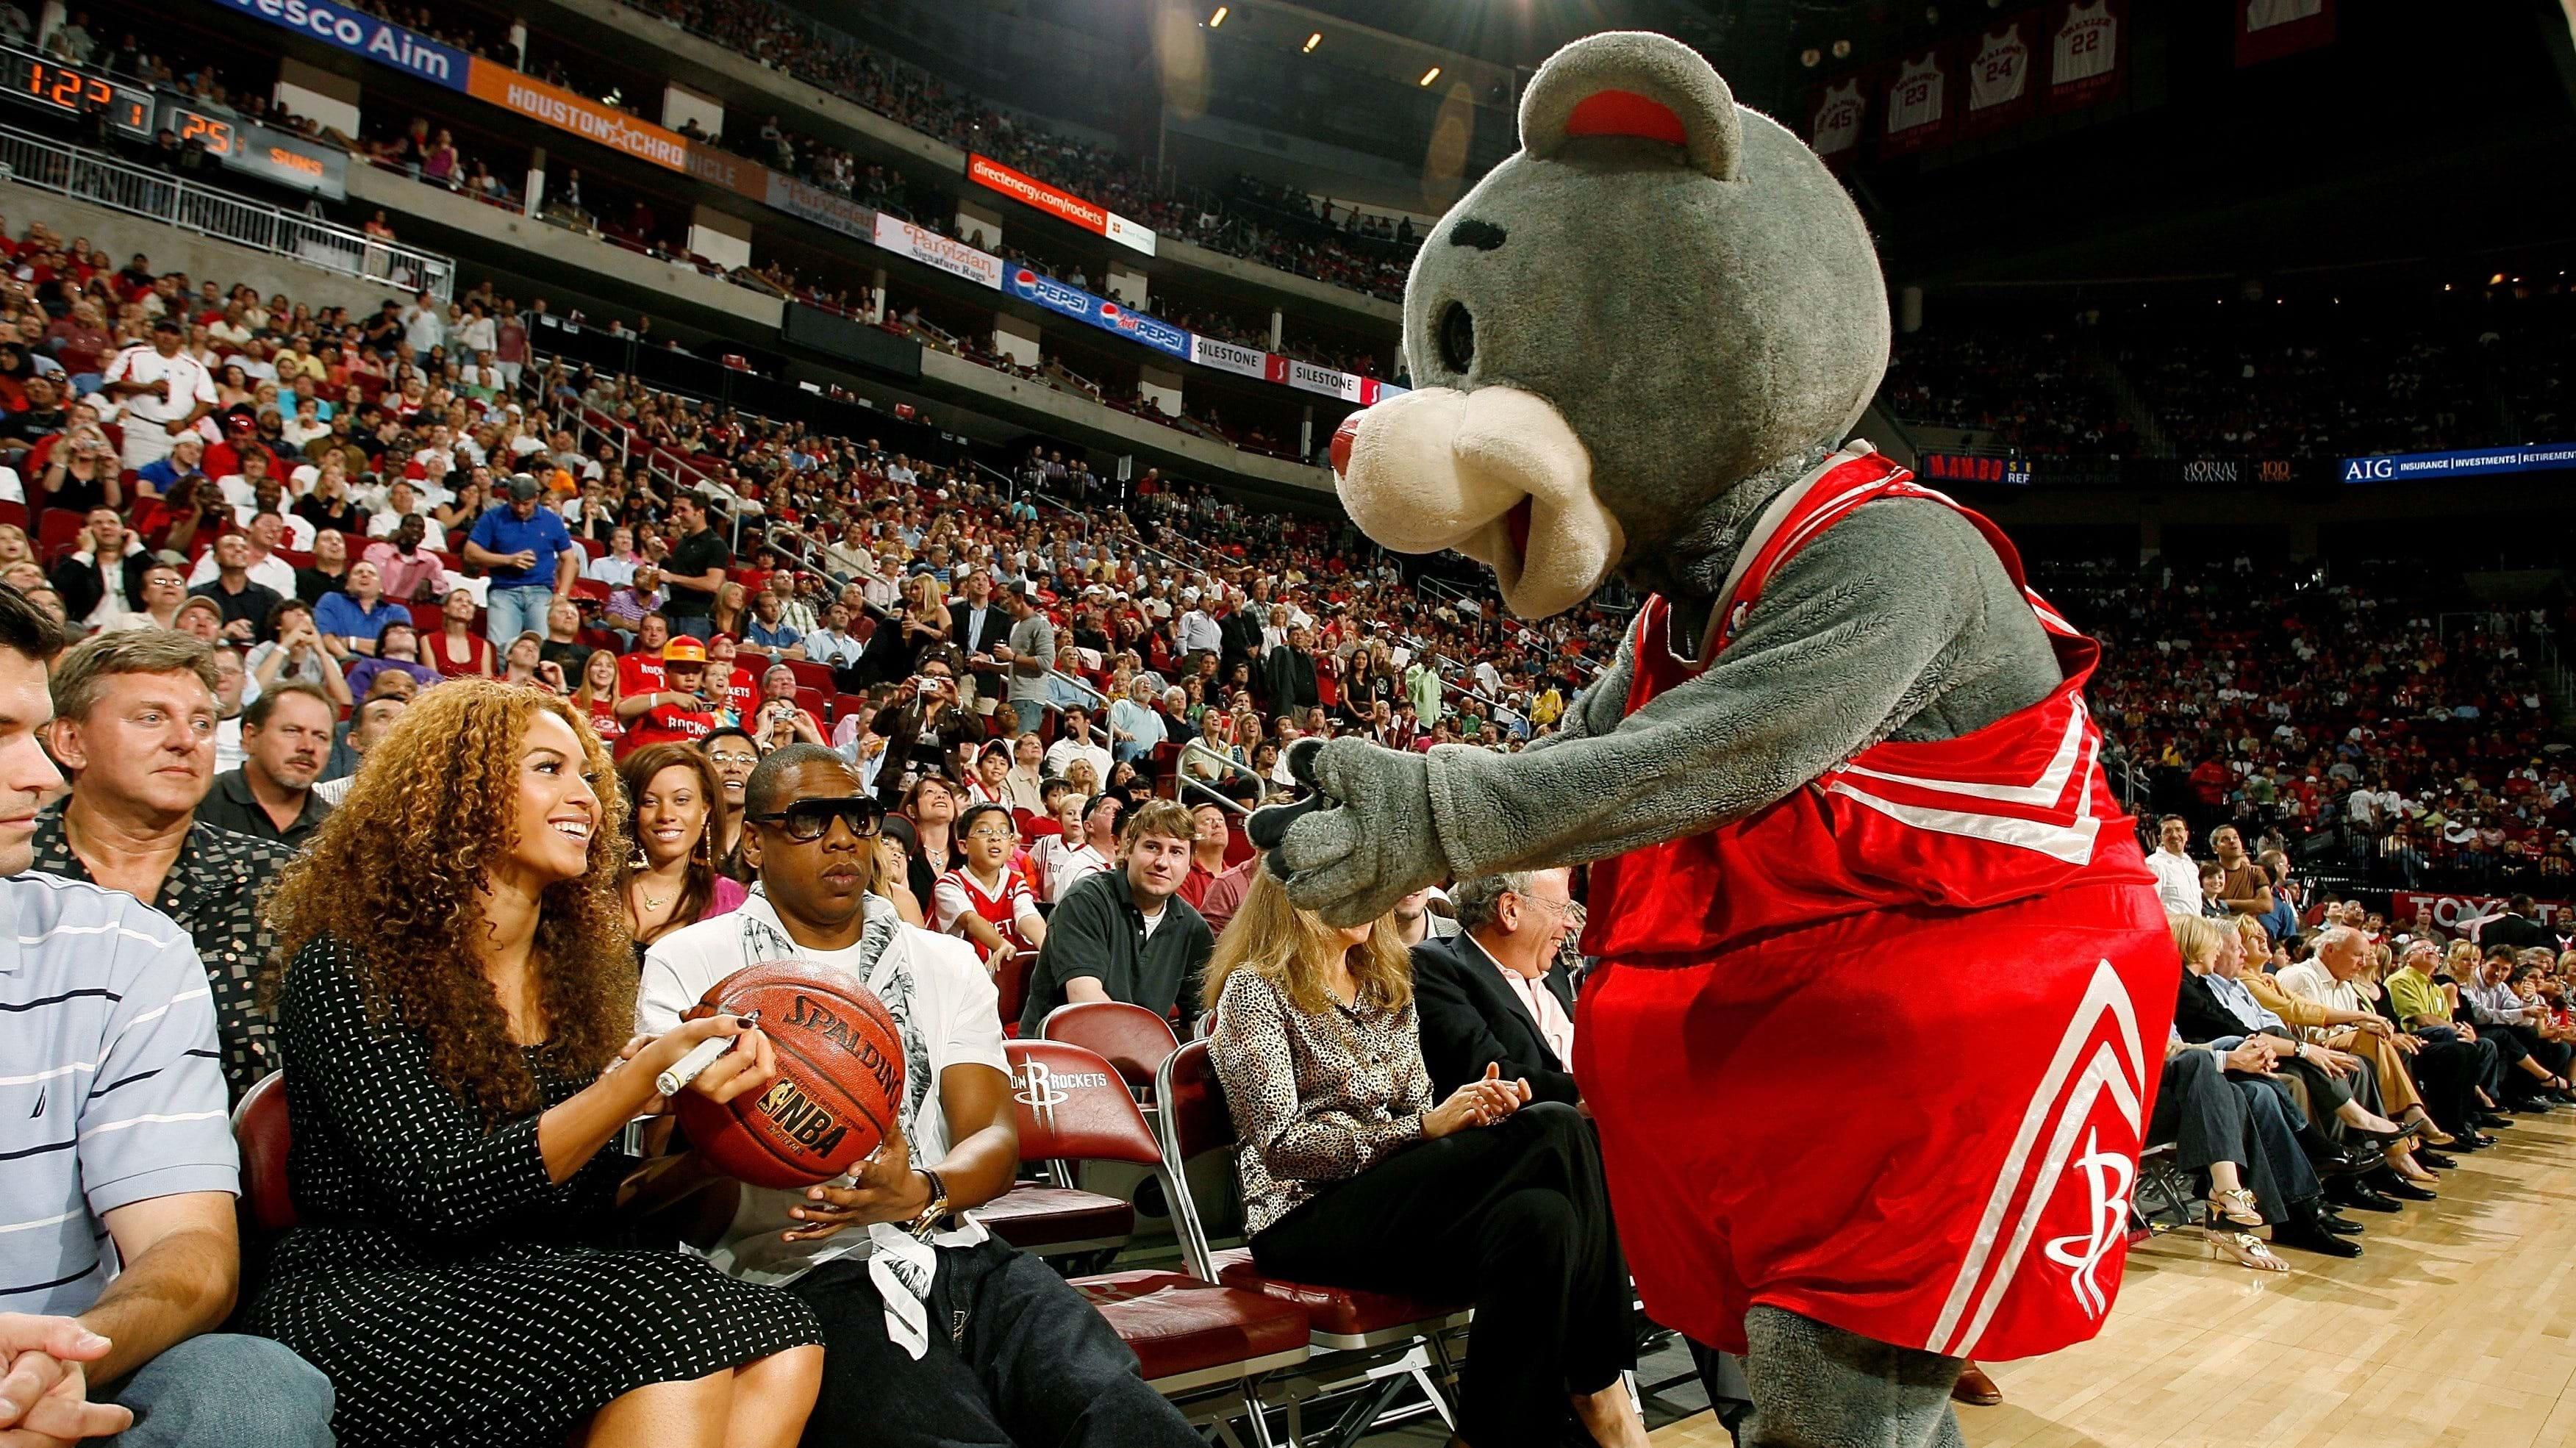 Golden Nugget Owner Tilman Fertitta To Buy Houston Rockets